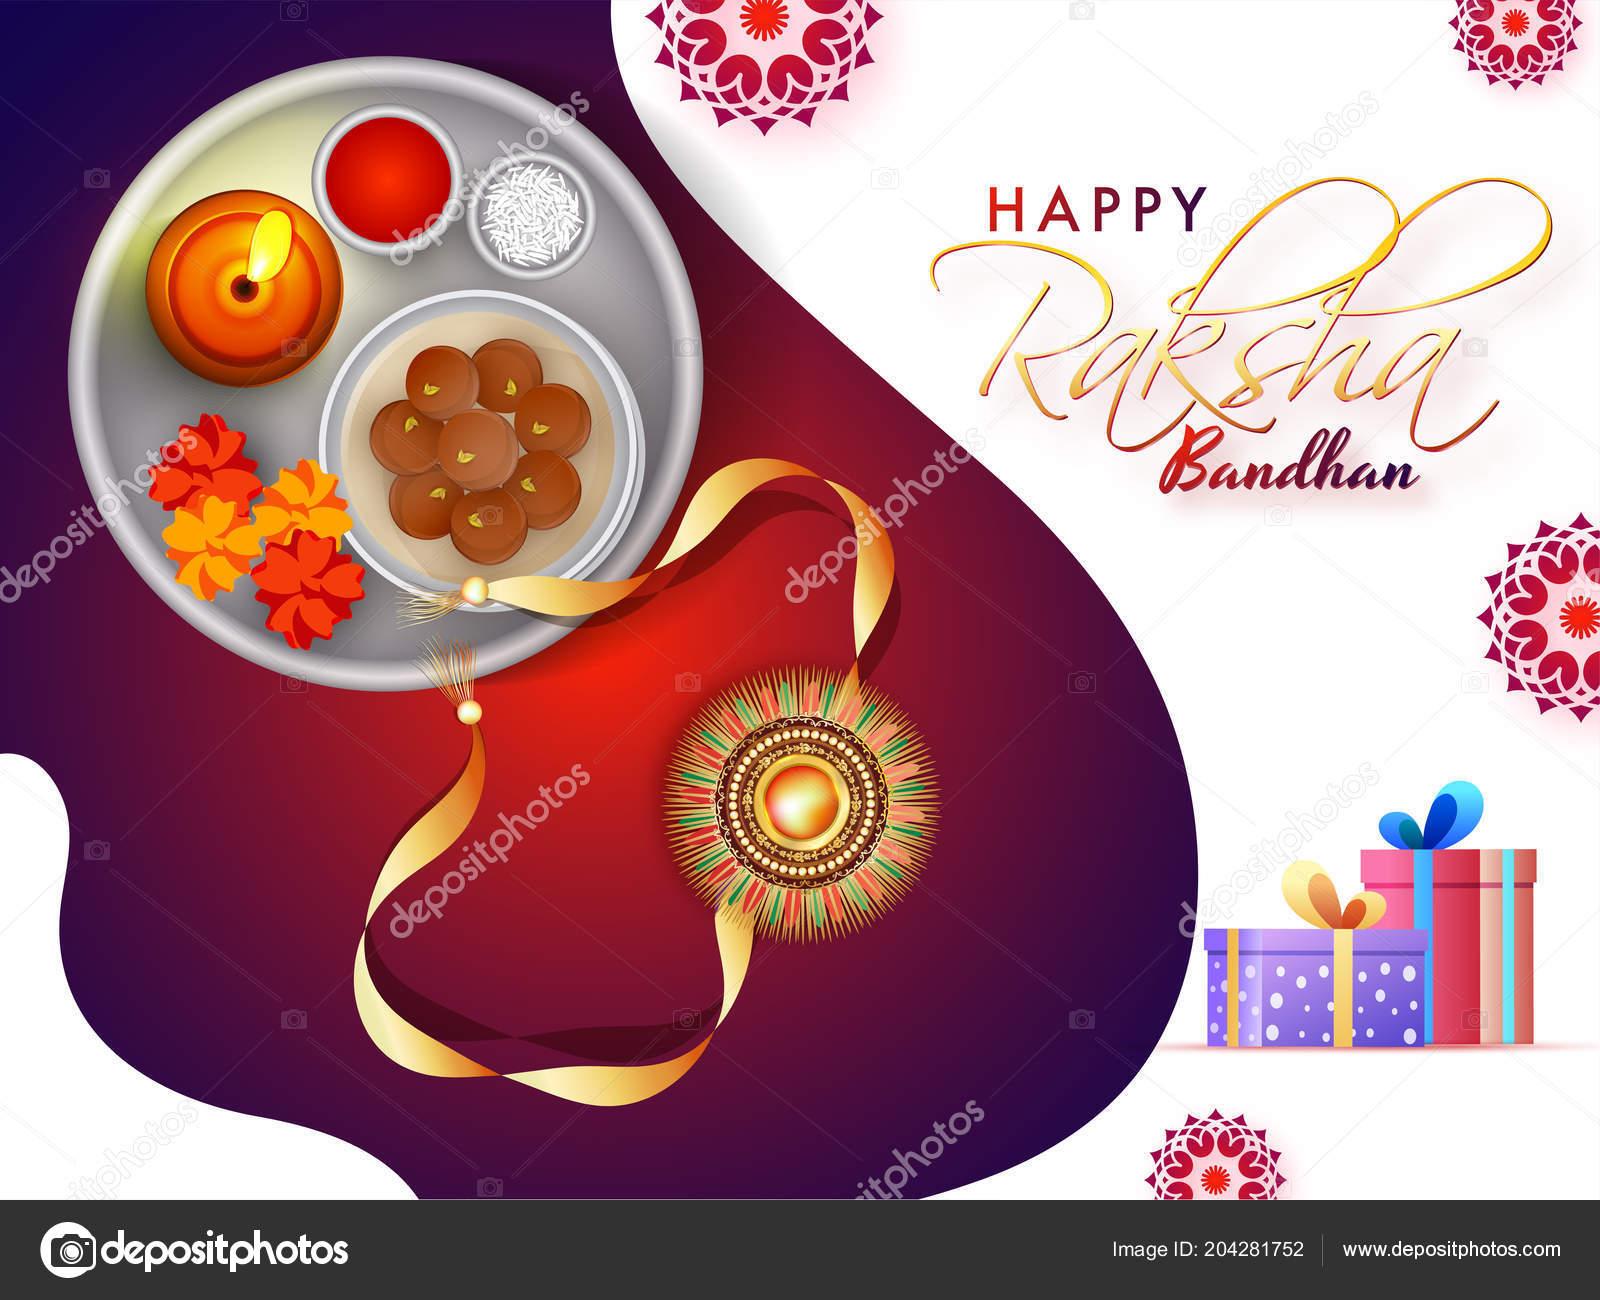 Happy raksha bandhan greeting card design illustration rakhi worship happy raksha bandhan greeting card design illustration rakhi worship plate stock vector m4hsunfo